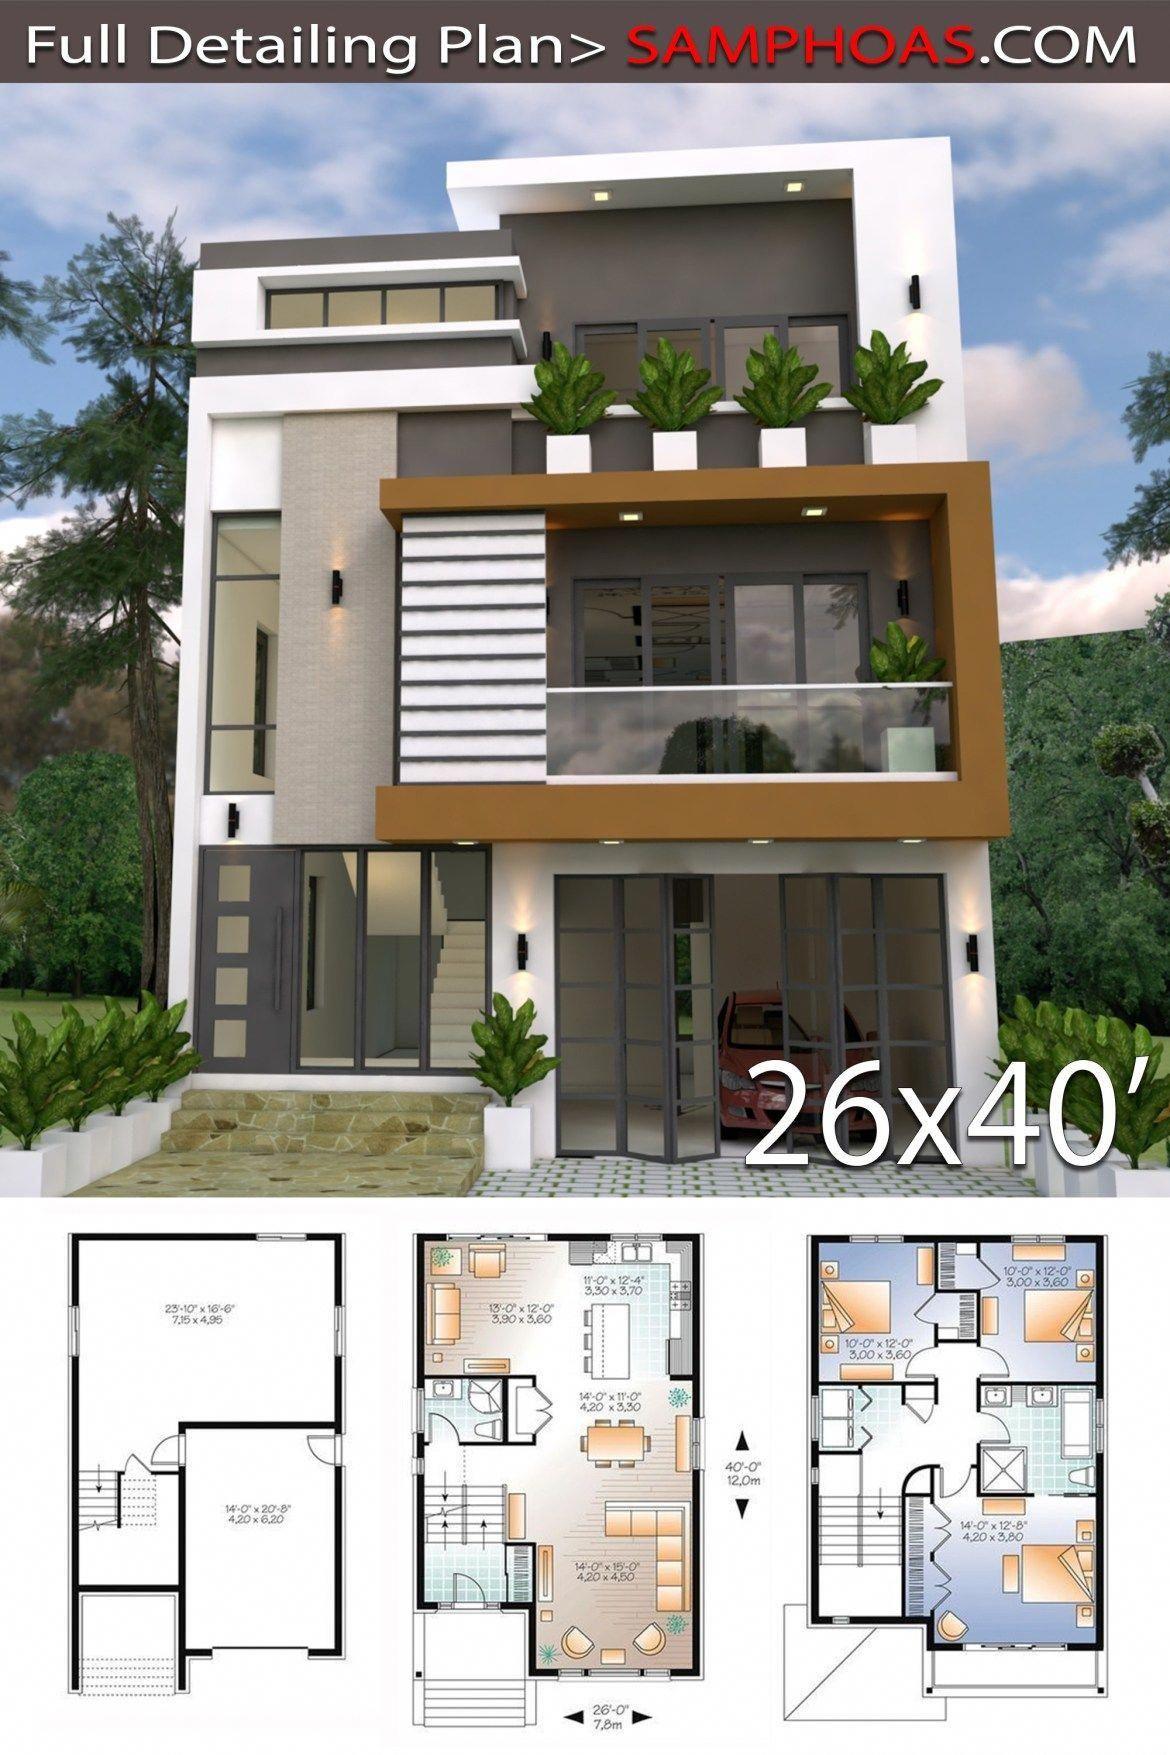 Home Design Plan 8x12m With 3 Bedrooms Samphoas Plansearch Homeinteriordesigns Duplex House Design Bungalow House Design Latest House Designs